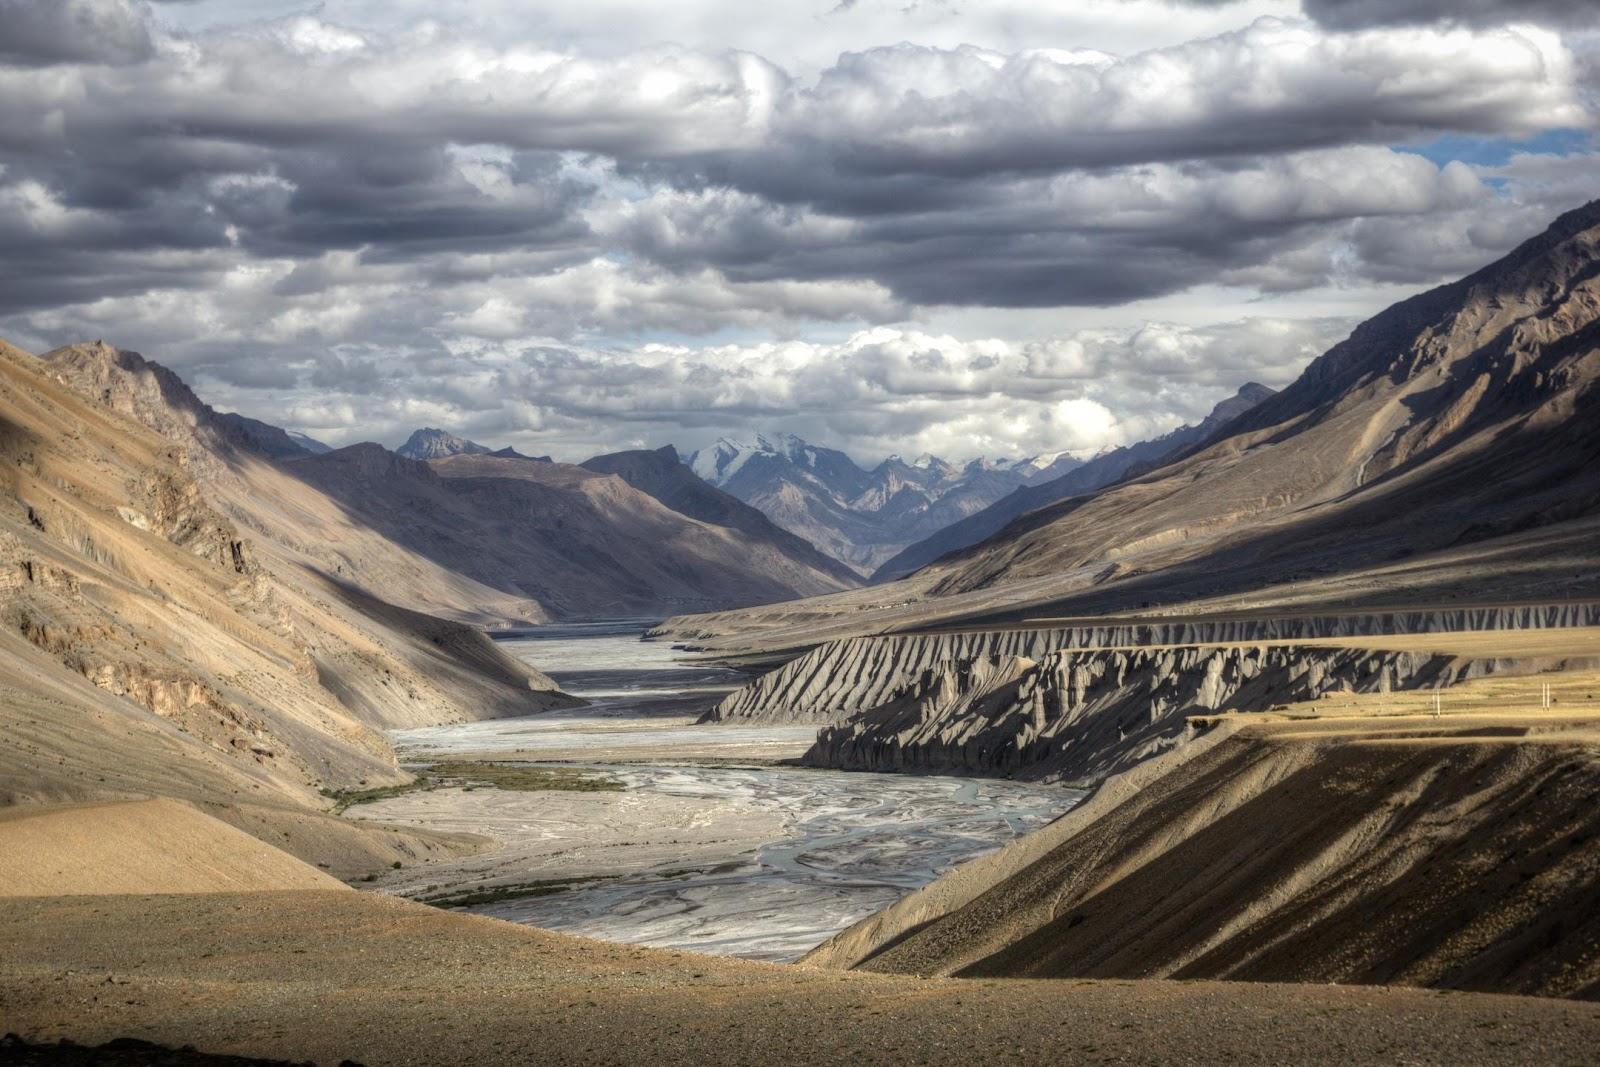 Camino_a_Spiti_valley,_Himachal_Pradesh_(8512880323).jpg